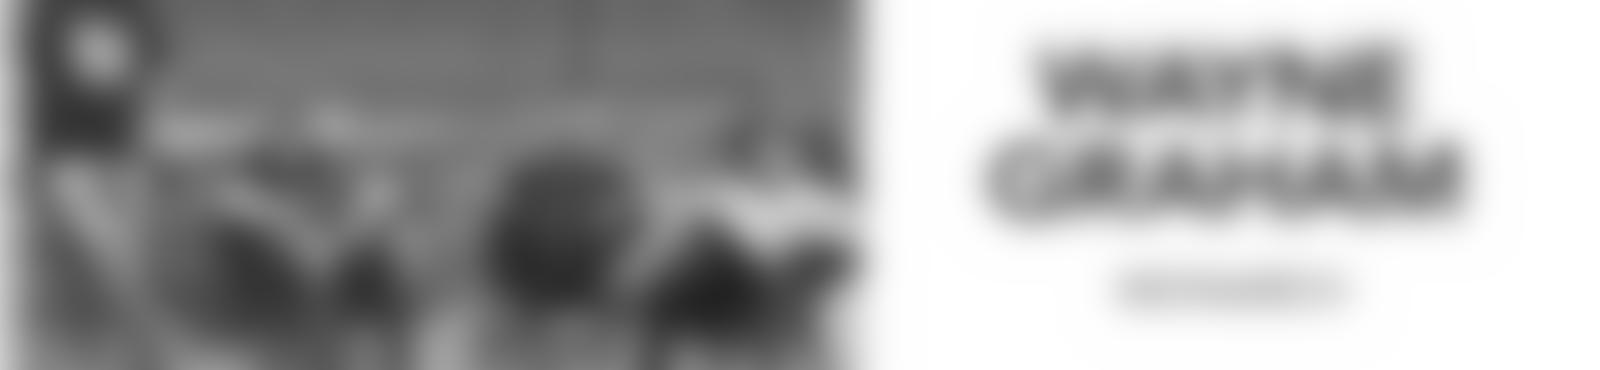 Blurred 2dd6afde 09b5 4a81 aaa2 f2bf28ab11c4